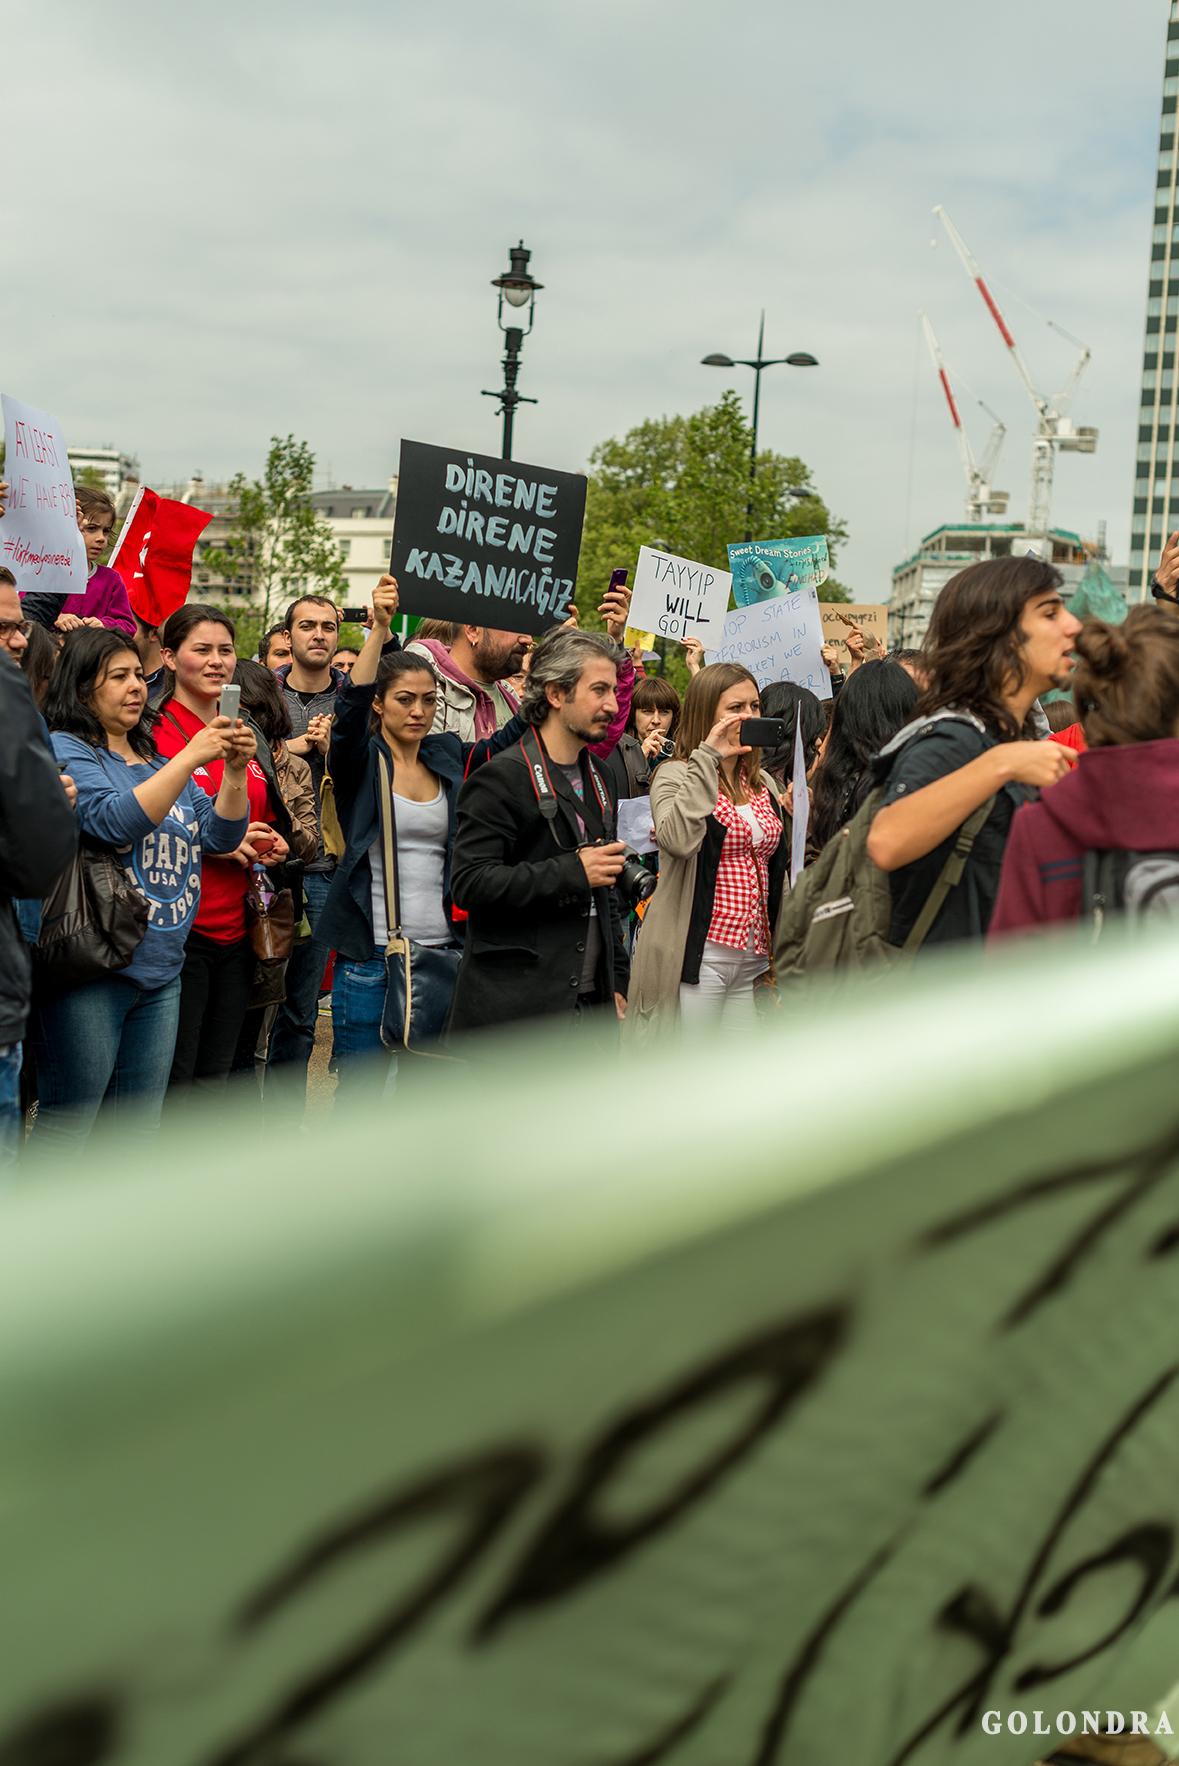 Protesting Turkish Government - Turk Hukumetini Protesto - Londra - London (8)